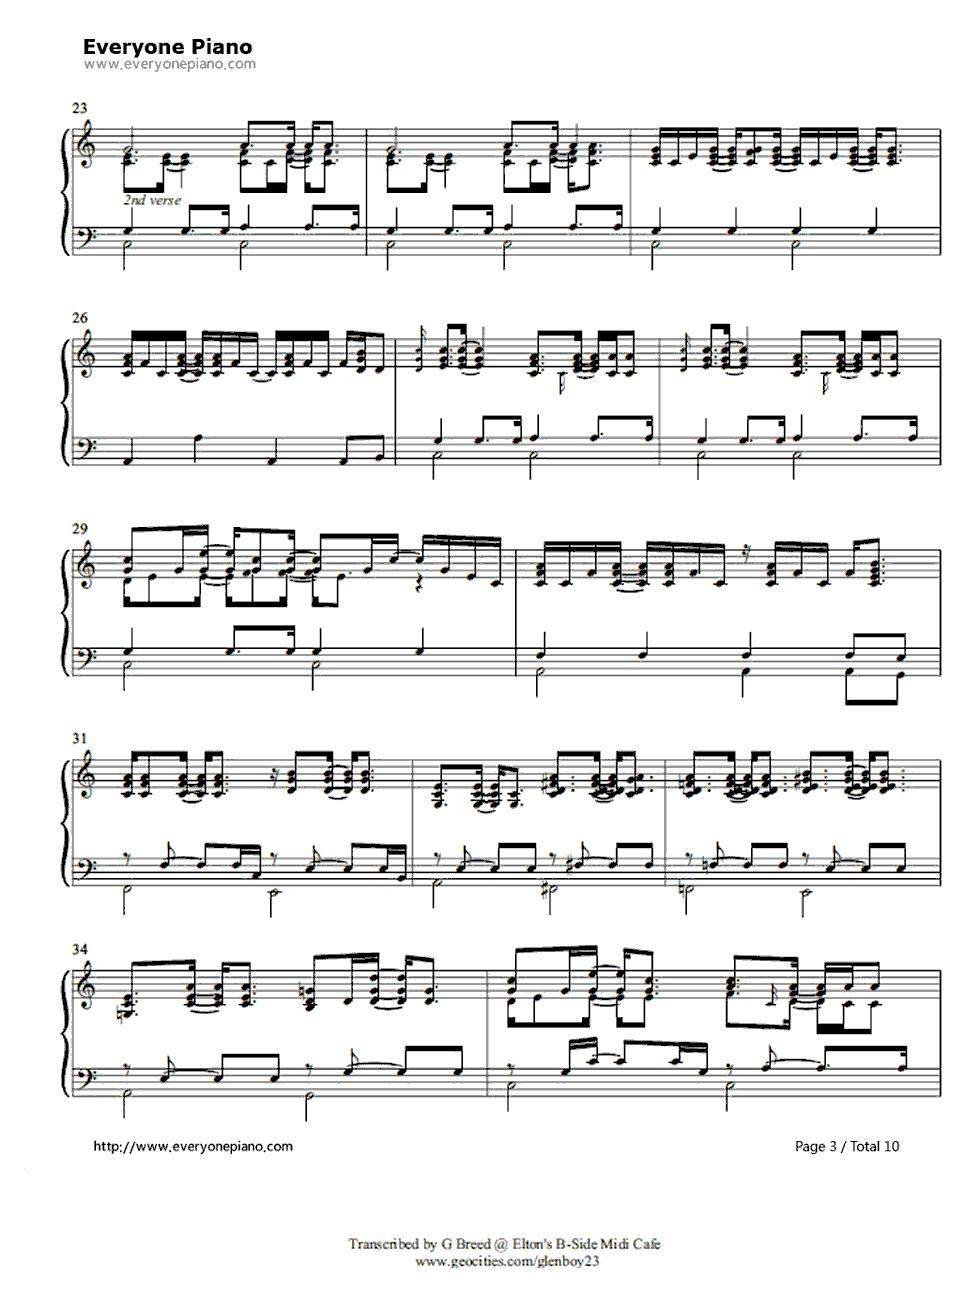 Tiny dancer elton john stave preview 3 free piano sheet music listen now print sheet tiny dancer elton john stave preview 3 hexwebz Images